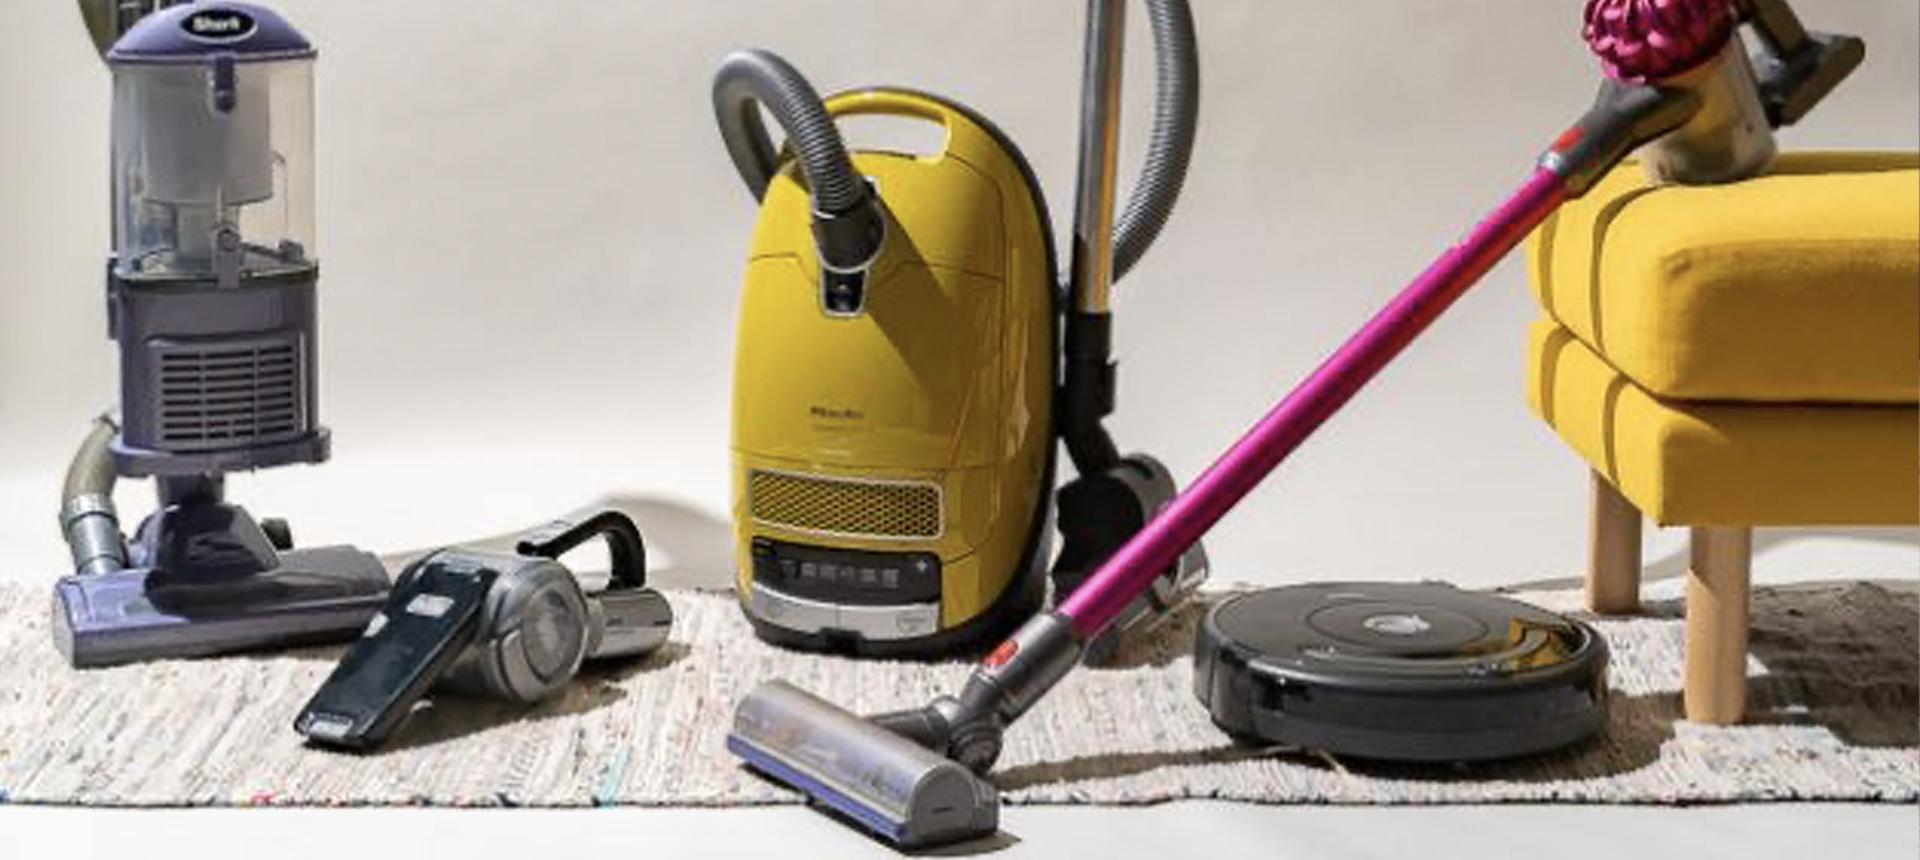 Vacuum Cleaner Reviews-2